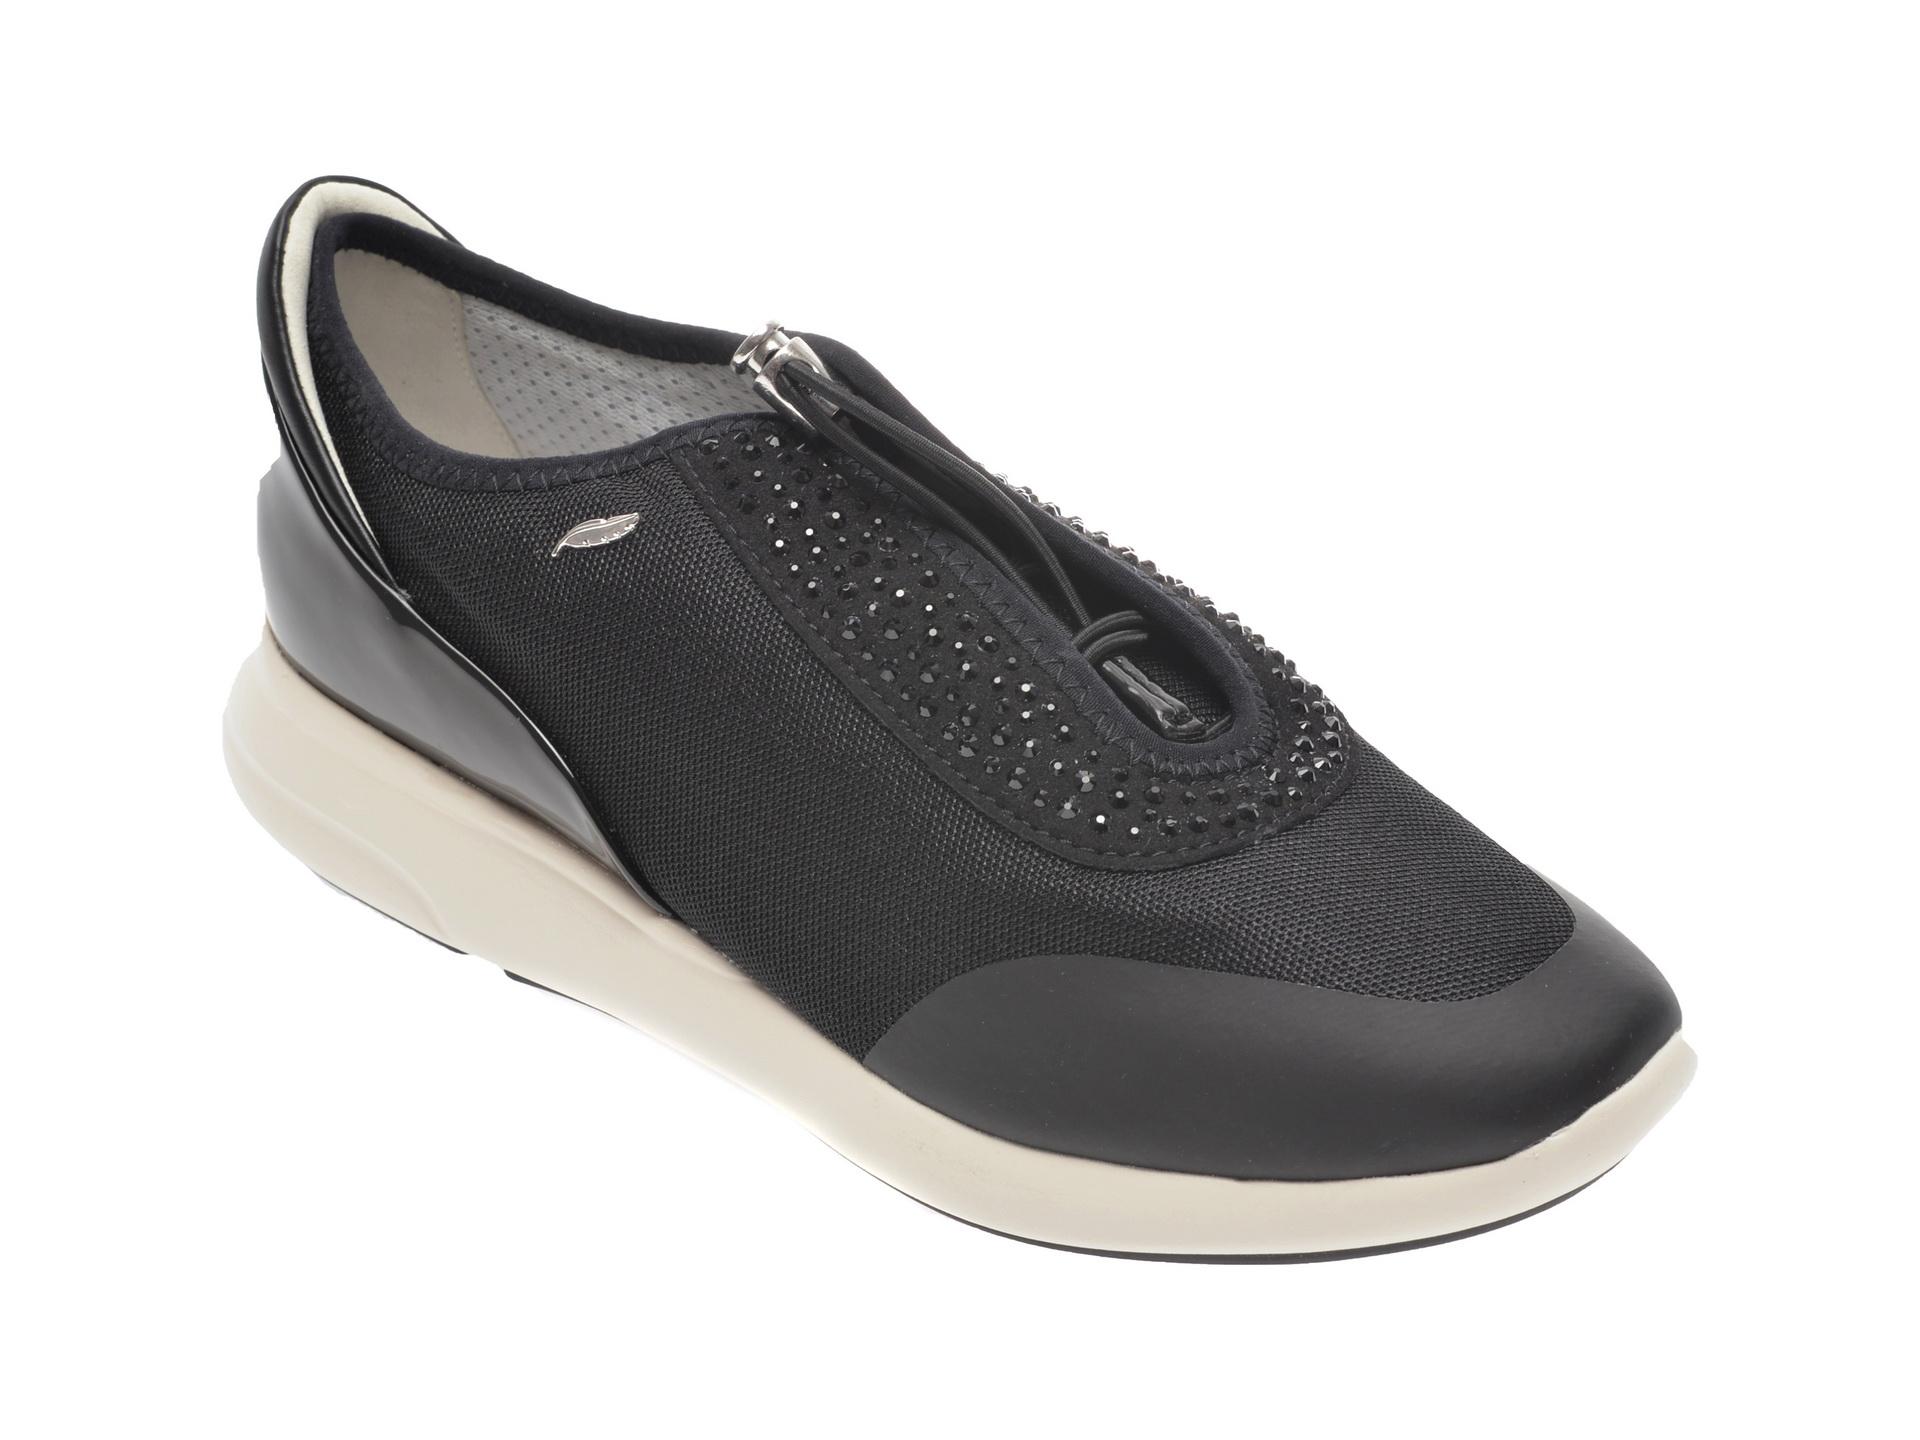 Pantofi sport GEOX negri, D621CE, din material textil si piele ecologica New